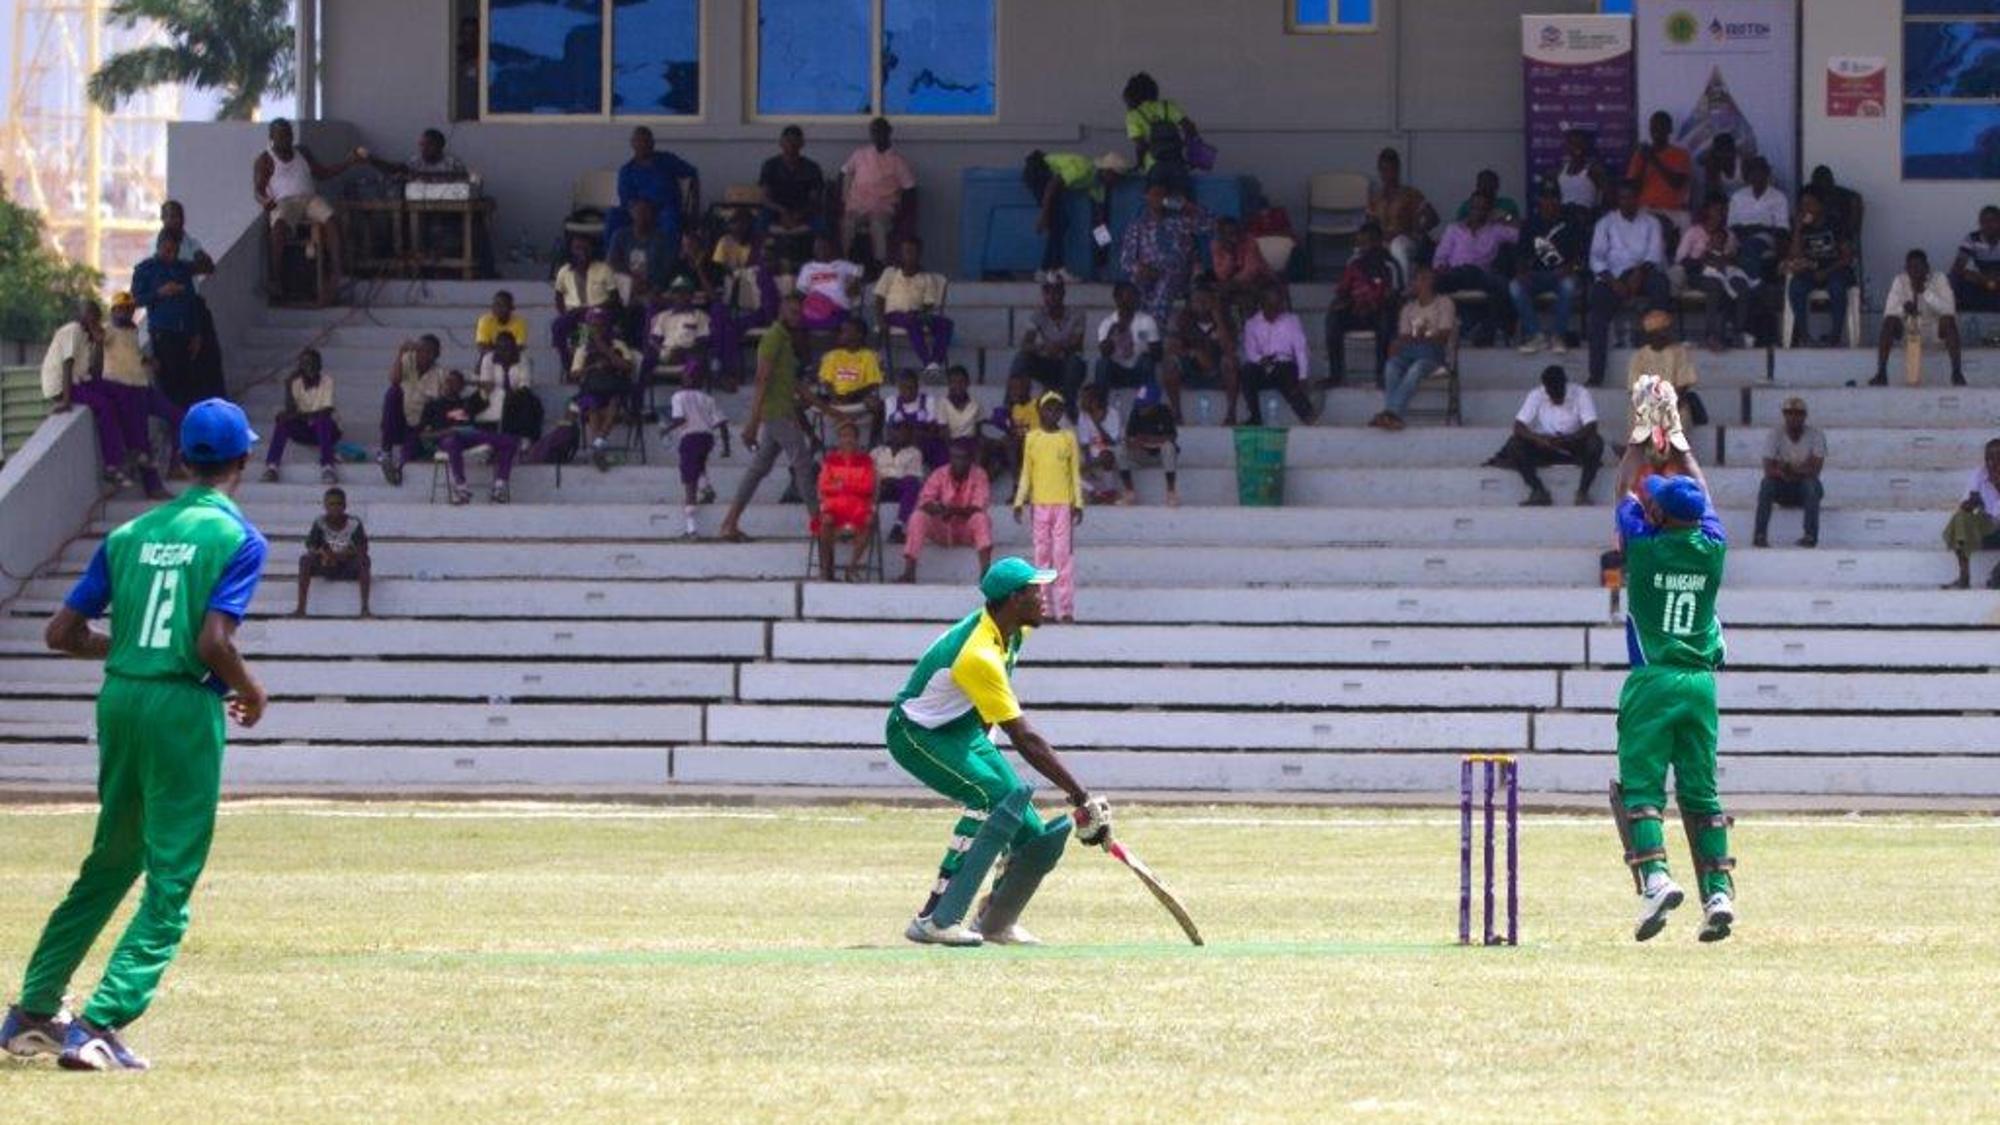 Mohammed Mansaray (Sierra Leone) gathers the ball as Chimezie Onwuzilike (Nigeria) watches on